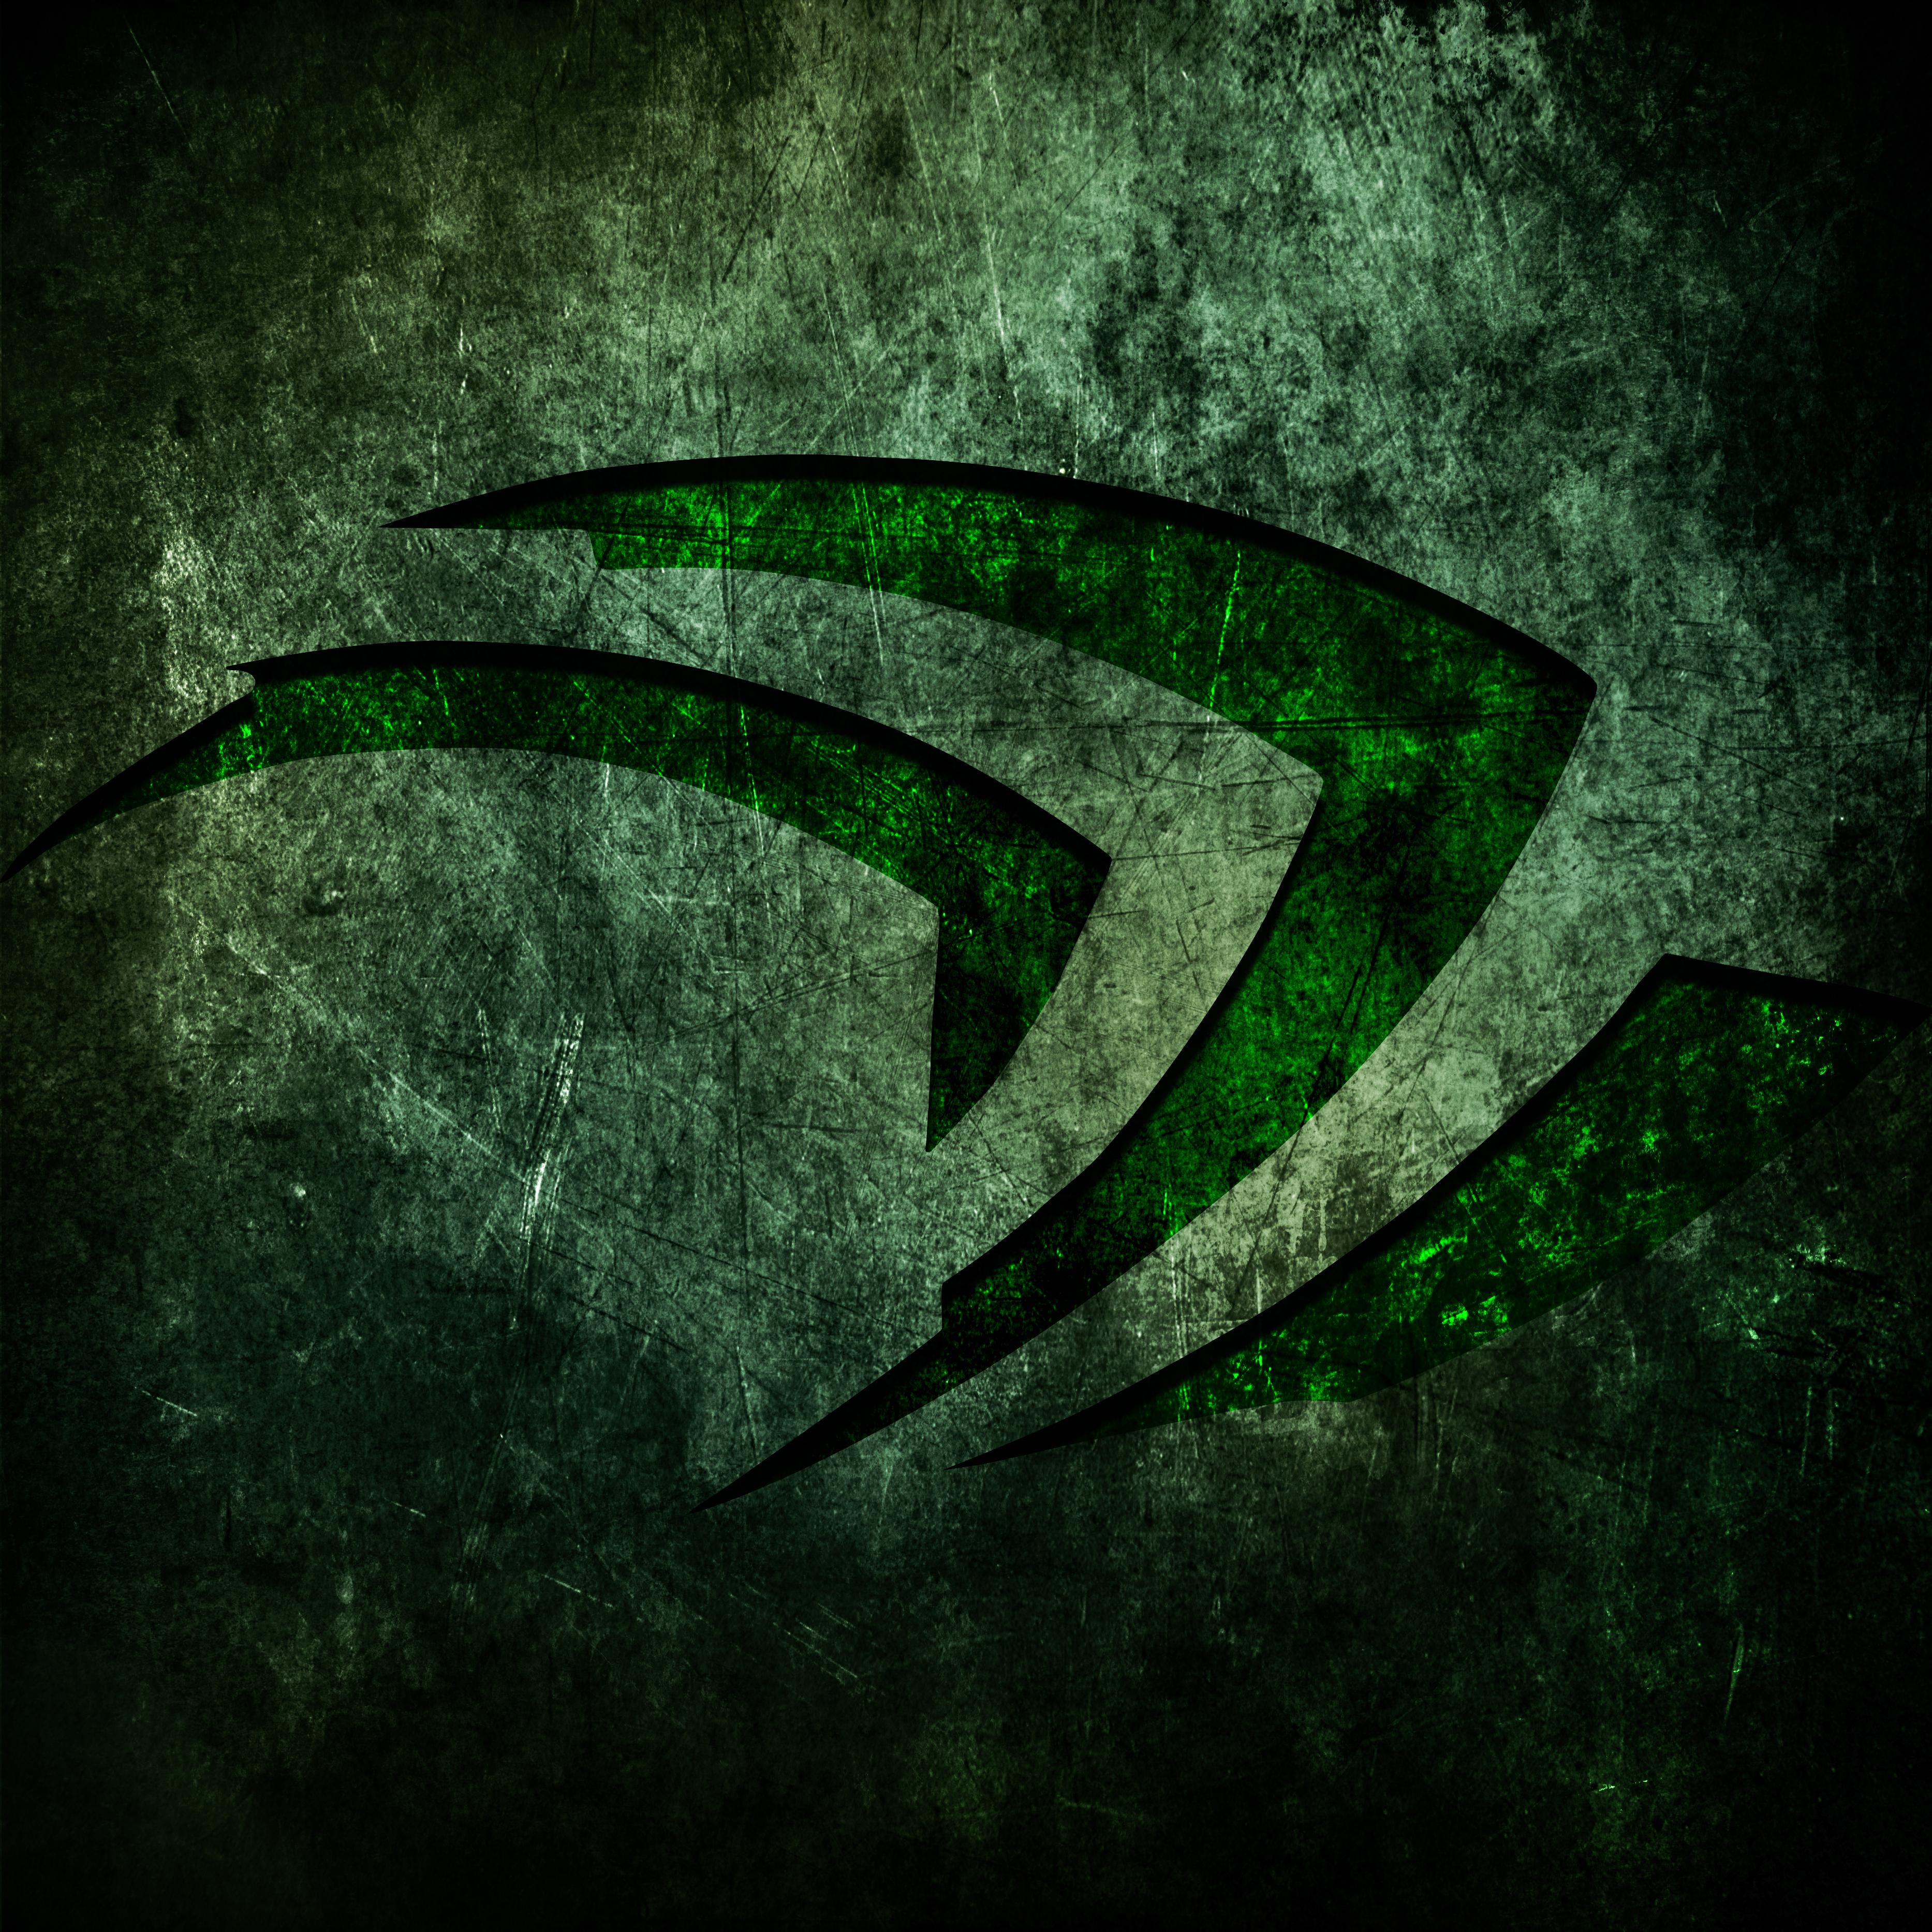 Nvidia Claw Logo By Ghos7walker On Deviantart